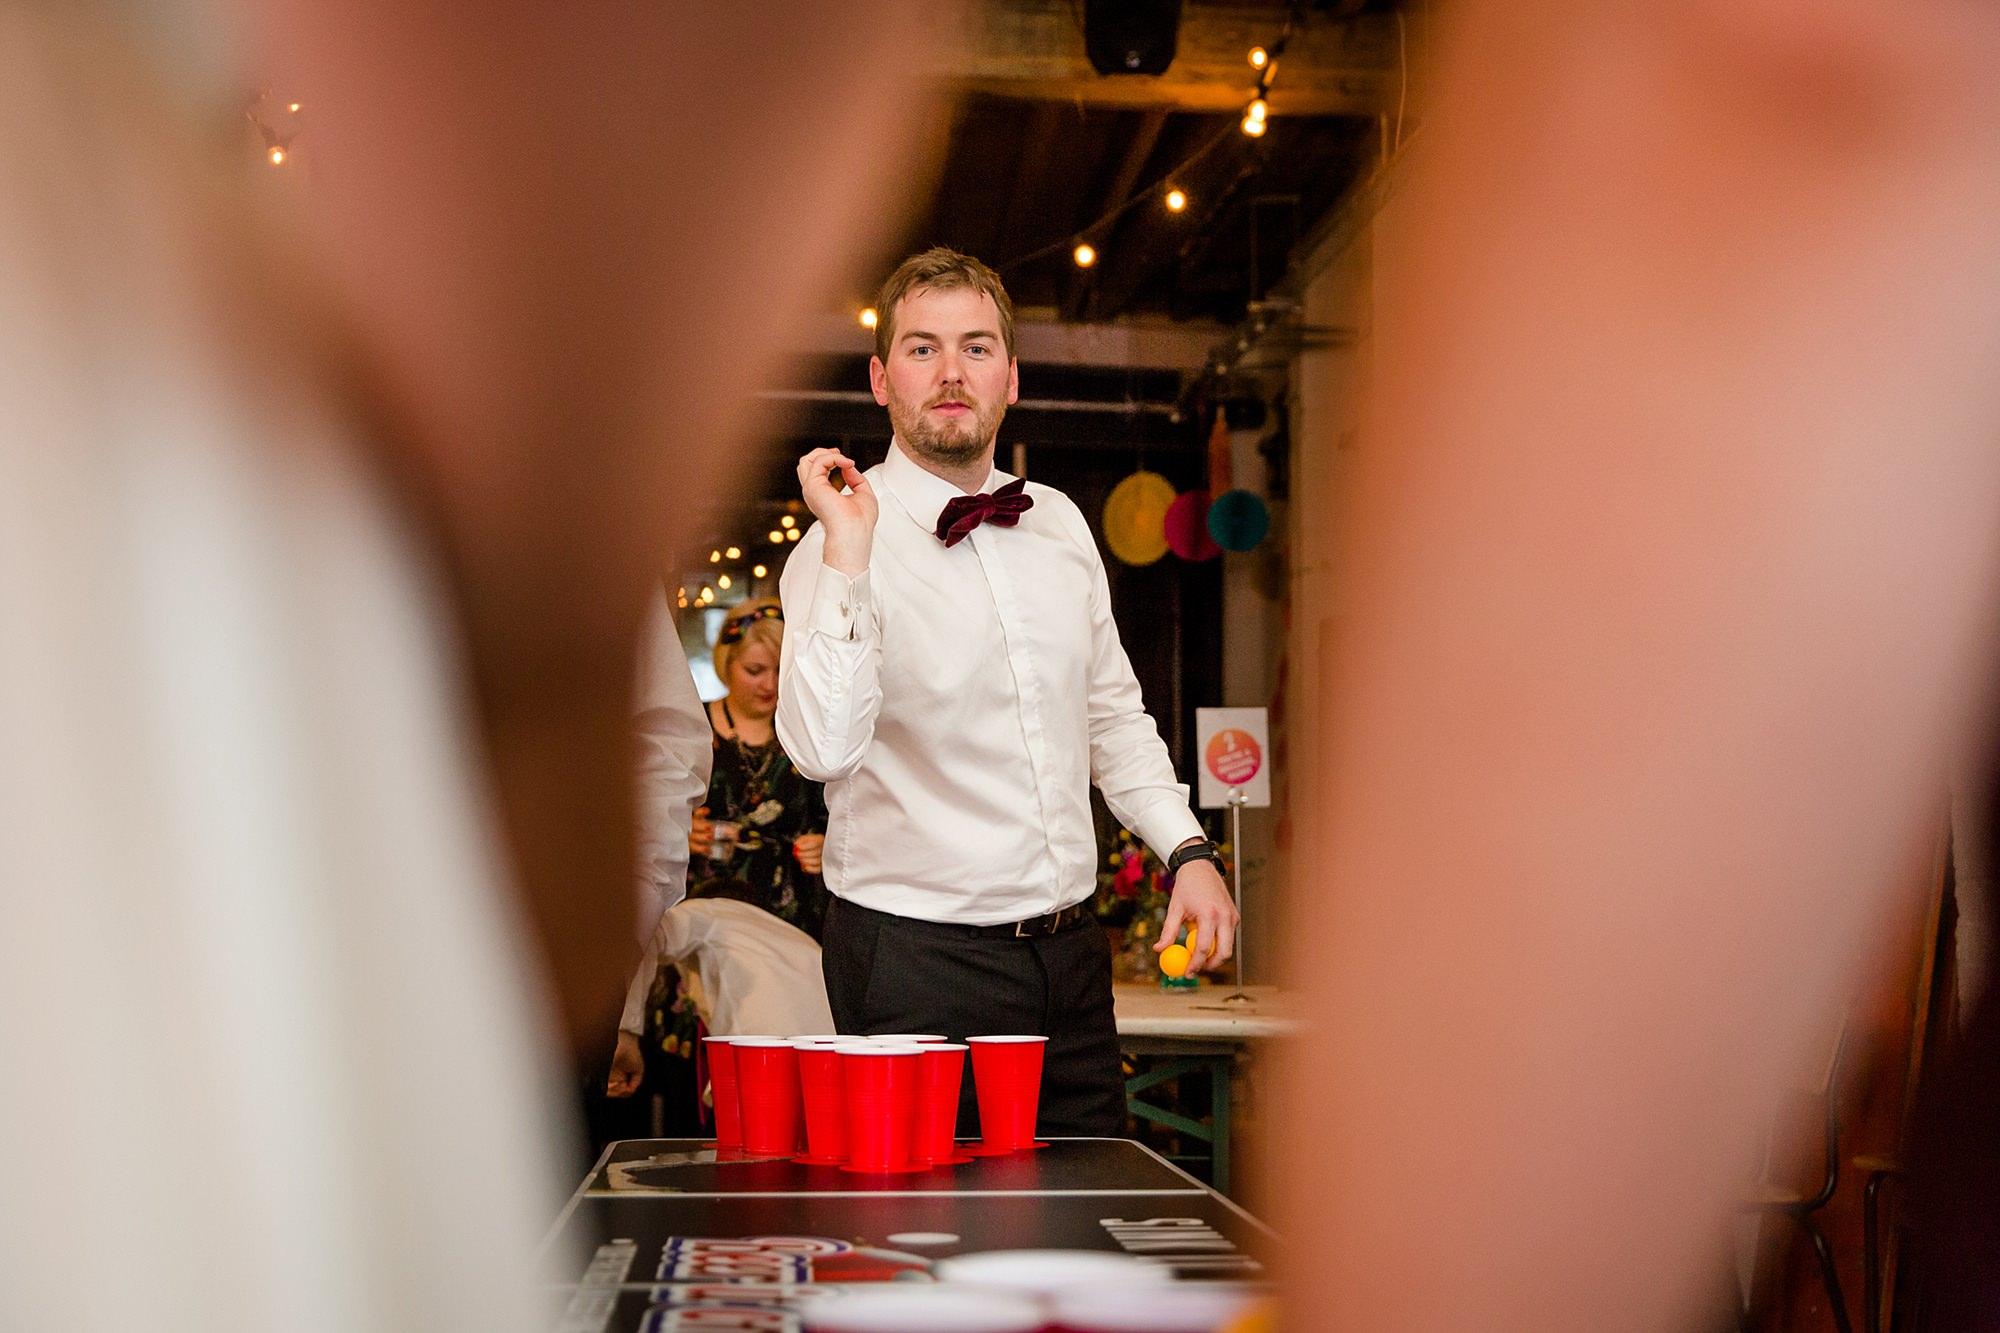 Fun London Wedding groom playing beer pong